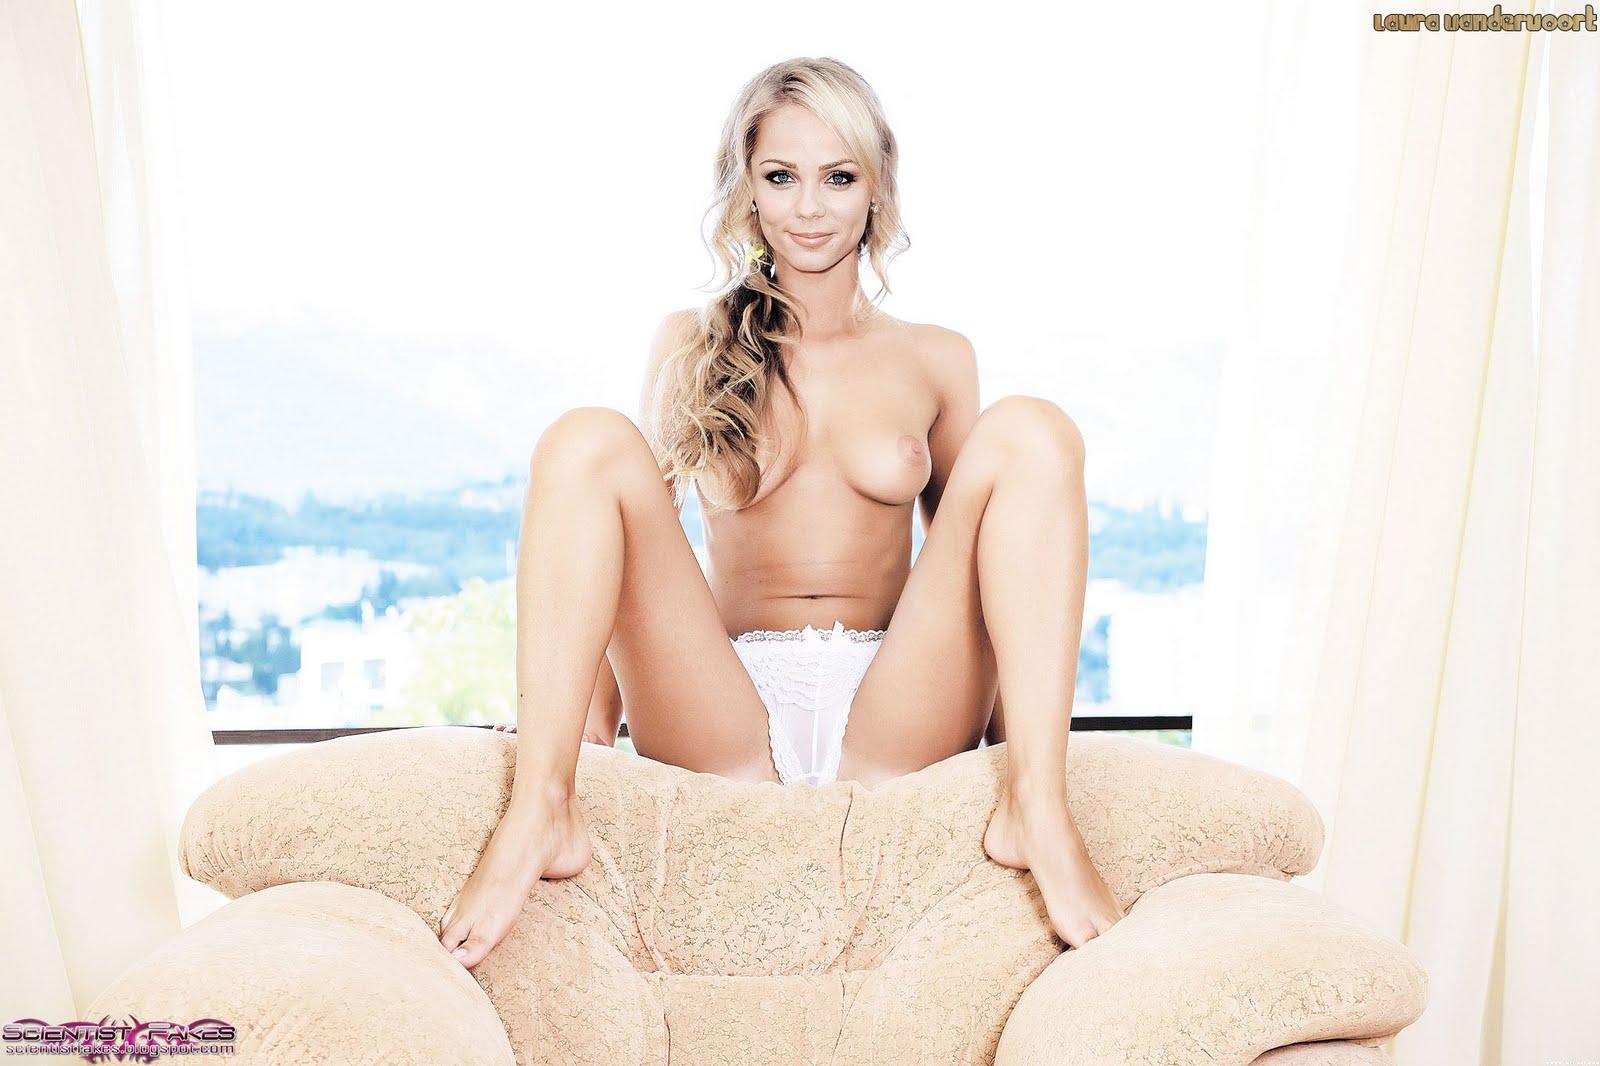 Fake Vanesa Romero Desnuda Scientist Fakes Sexy Erotic Girls